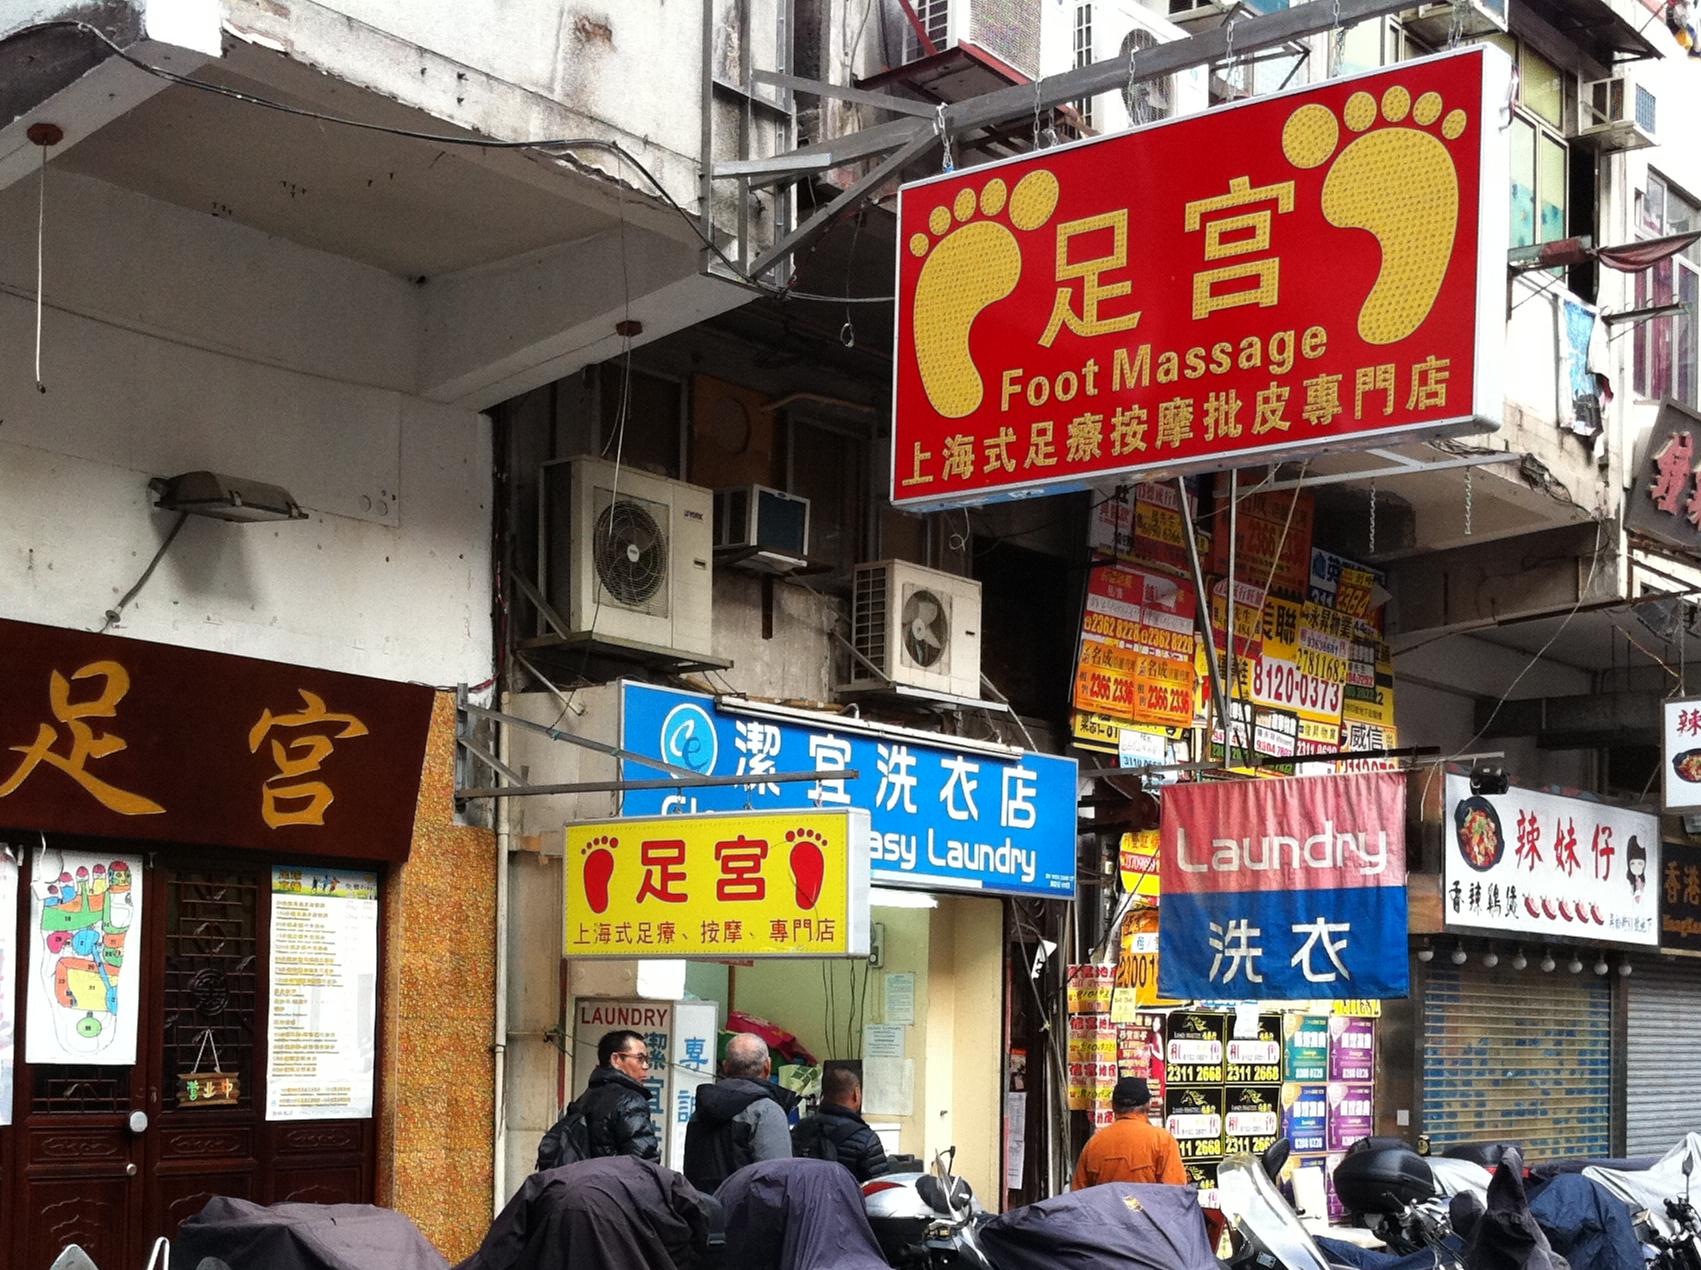 Hong Kong Foot Massage